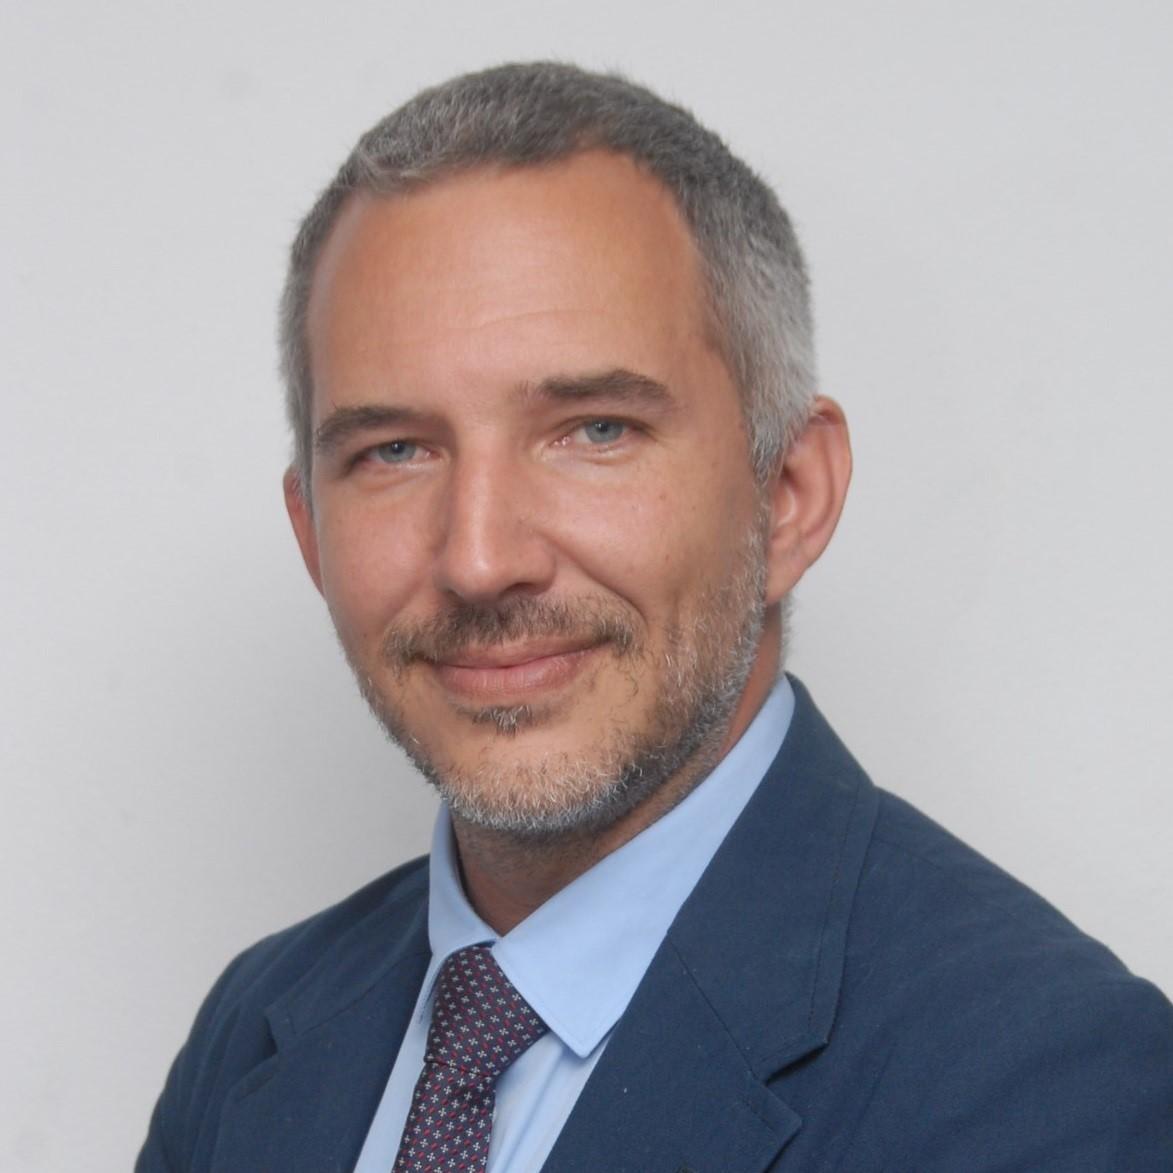 Cedric Guilleminot